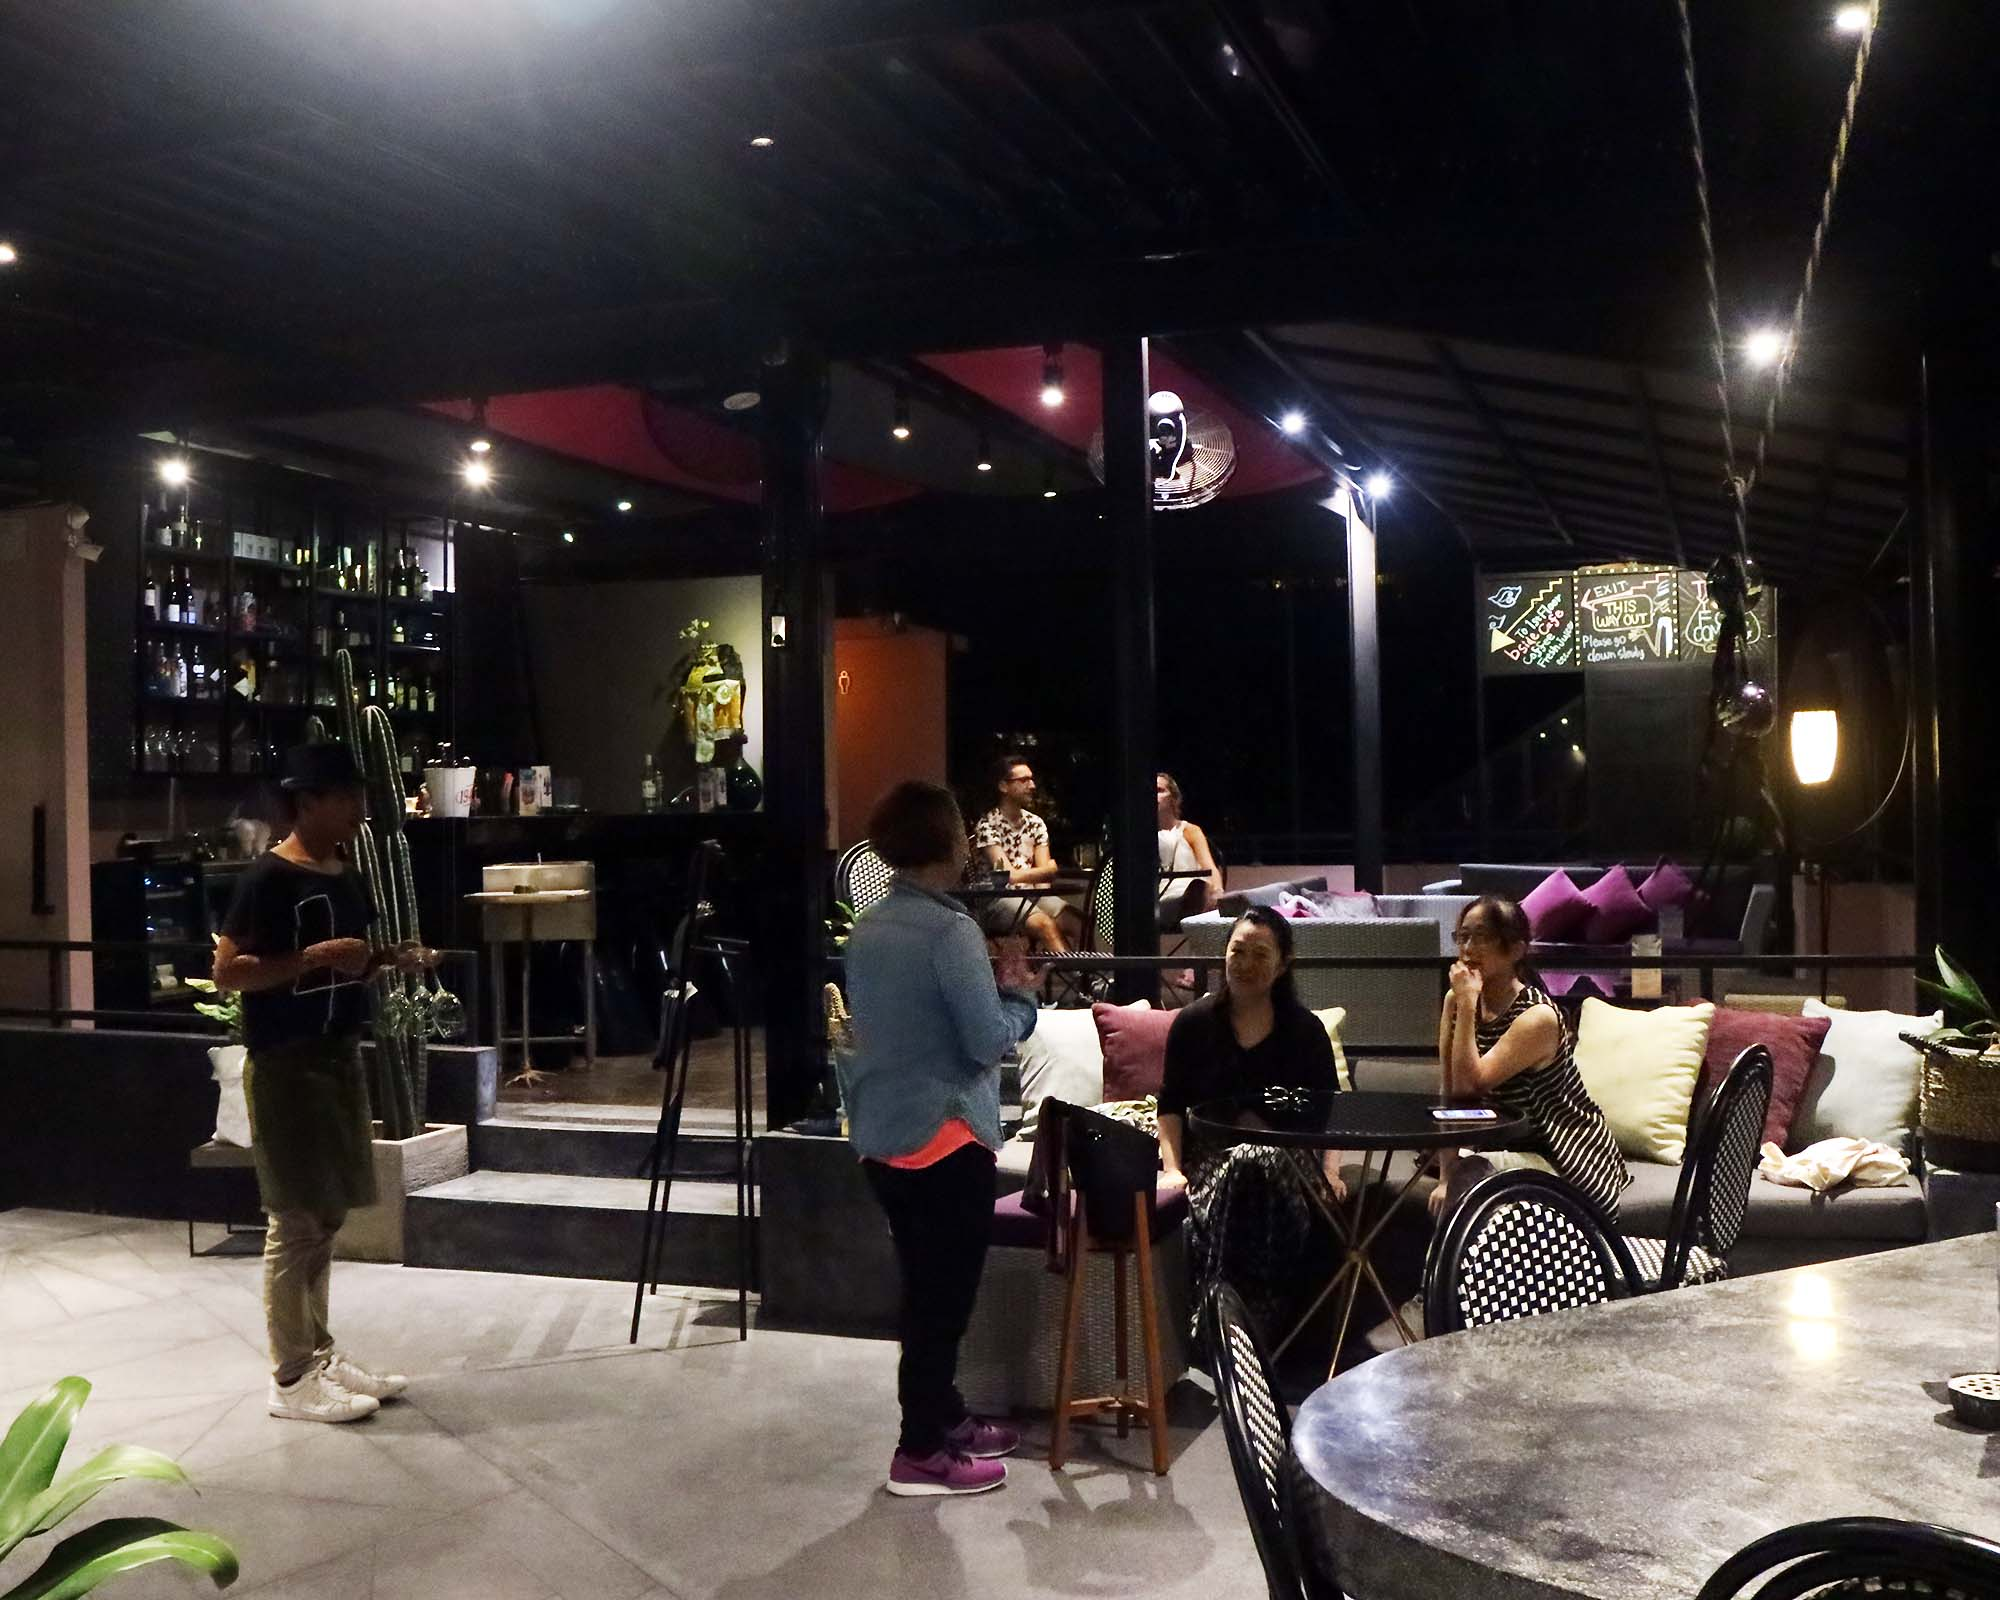 Modern Balinese Cafe bsideの画像7